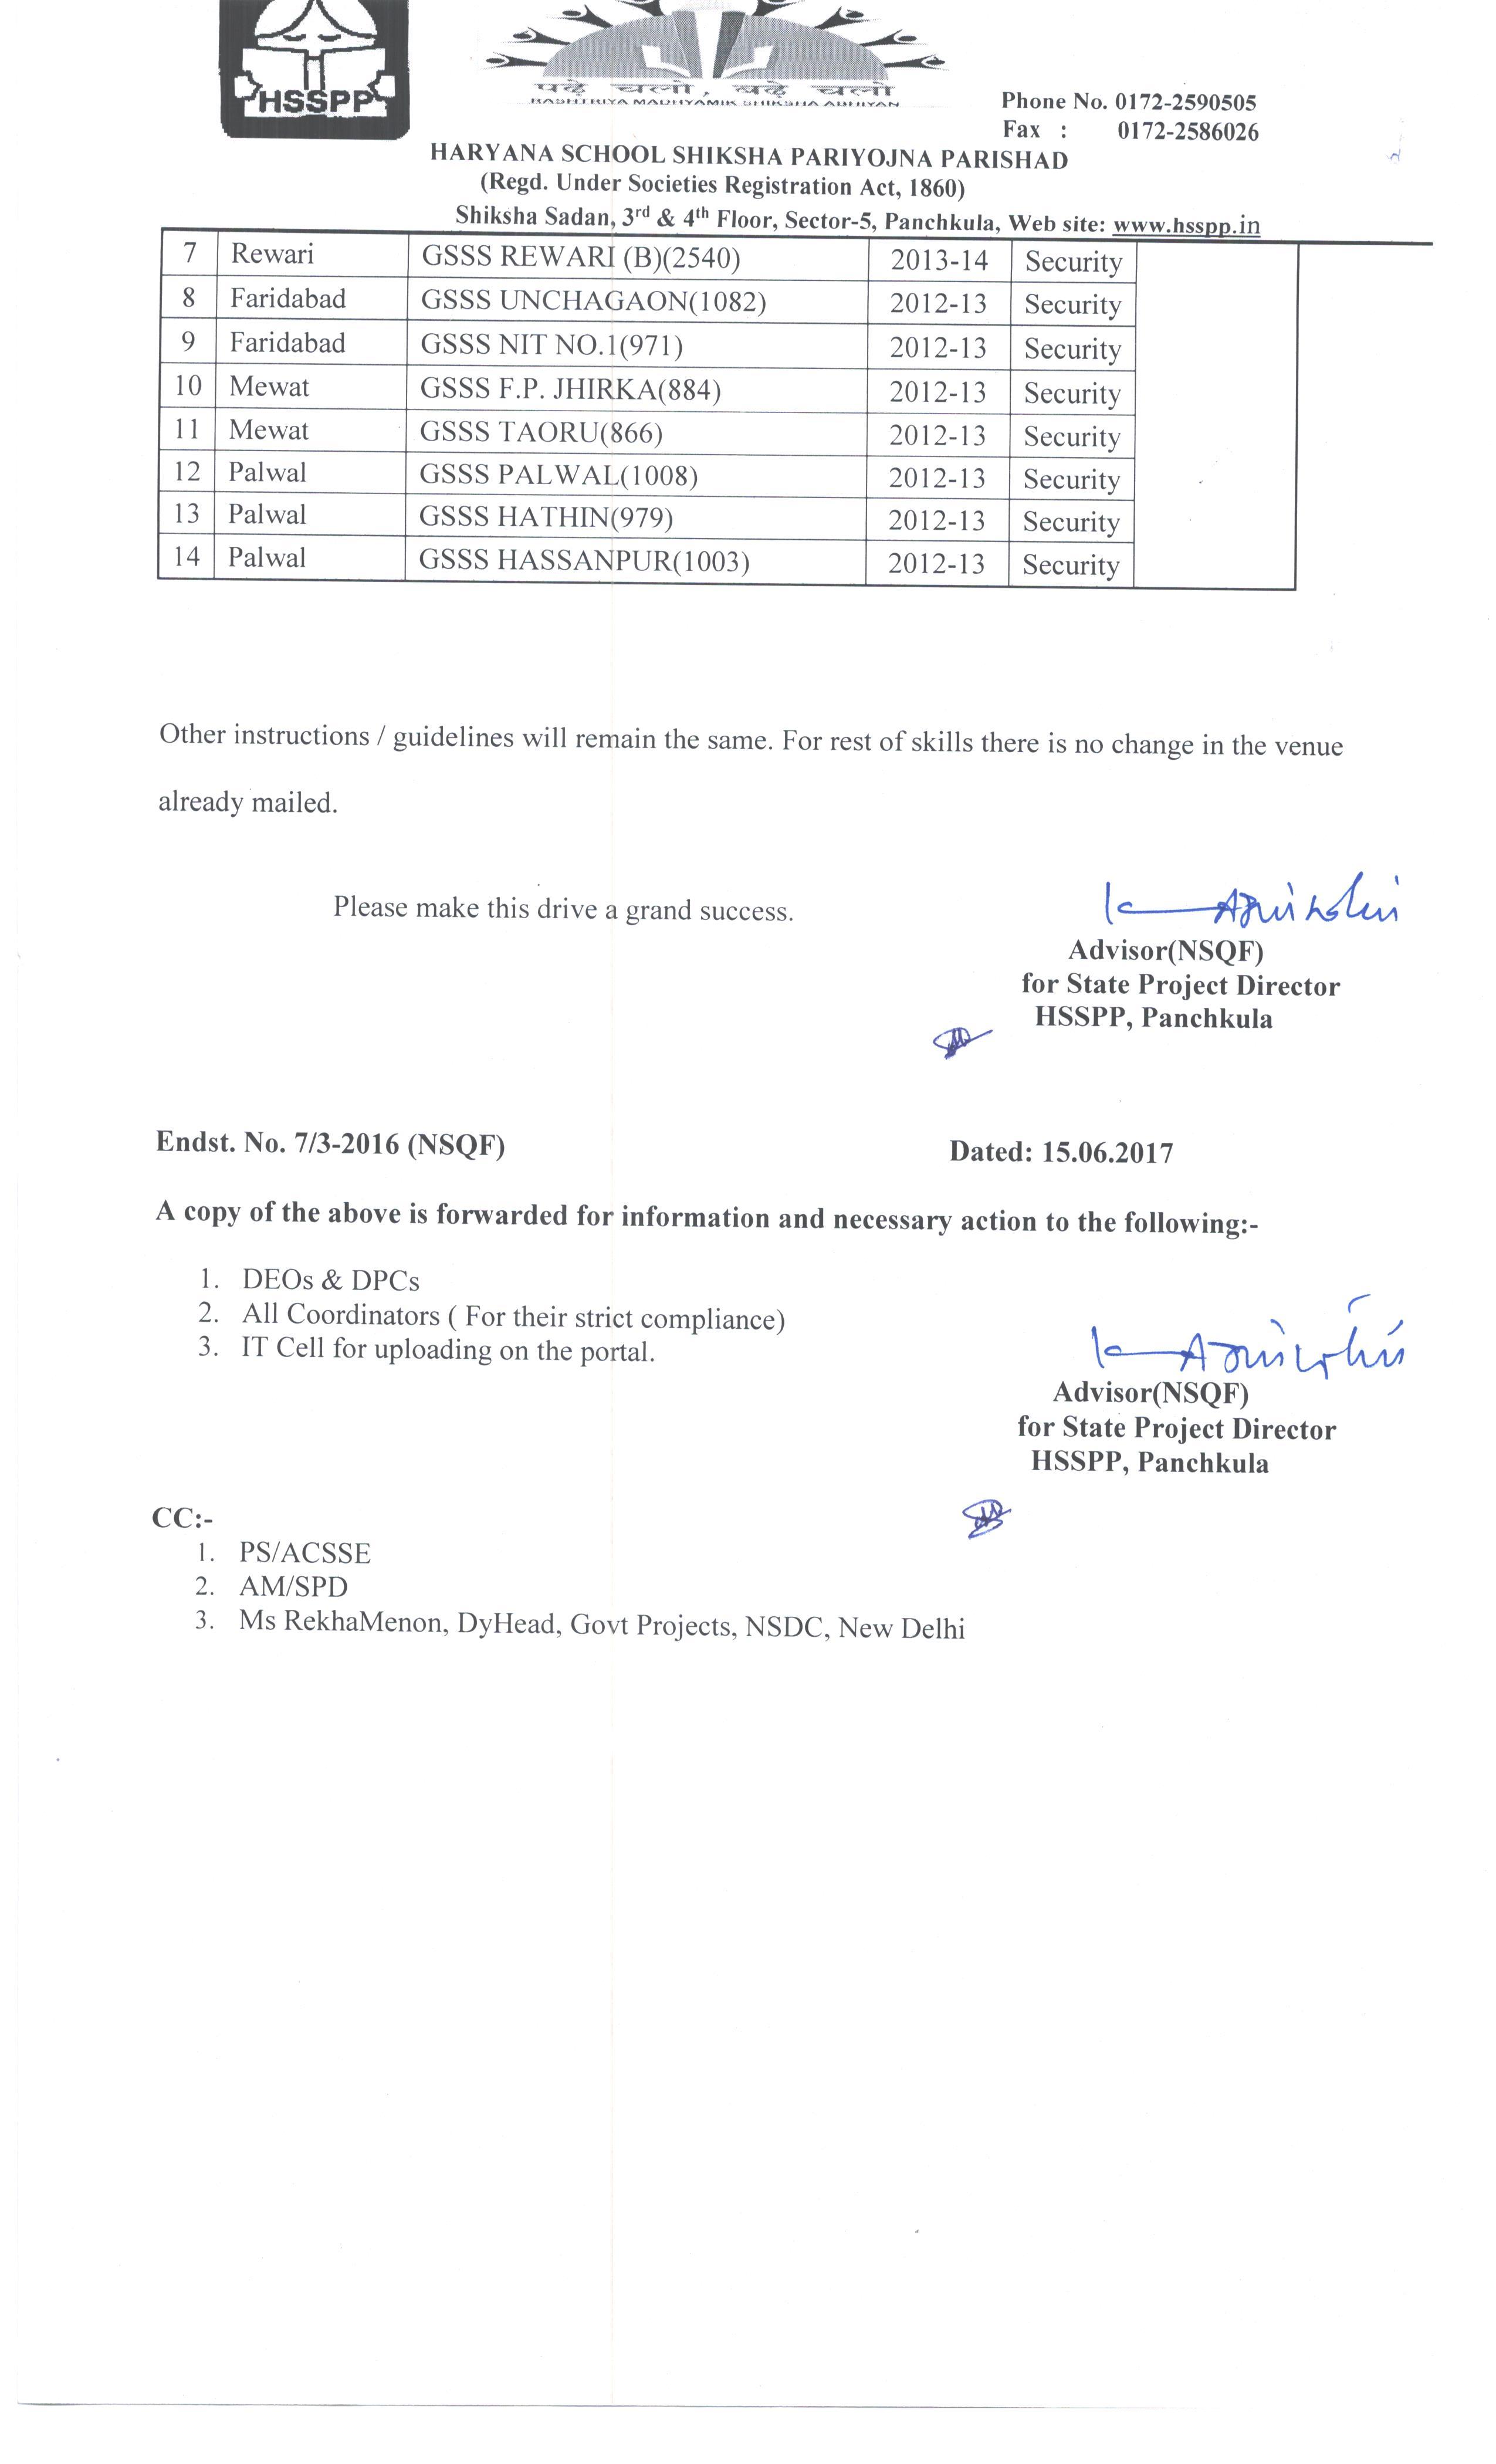 NSQF Haryana